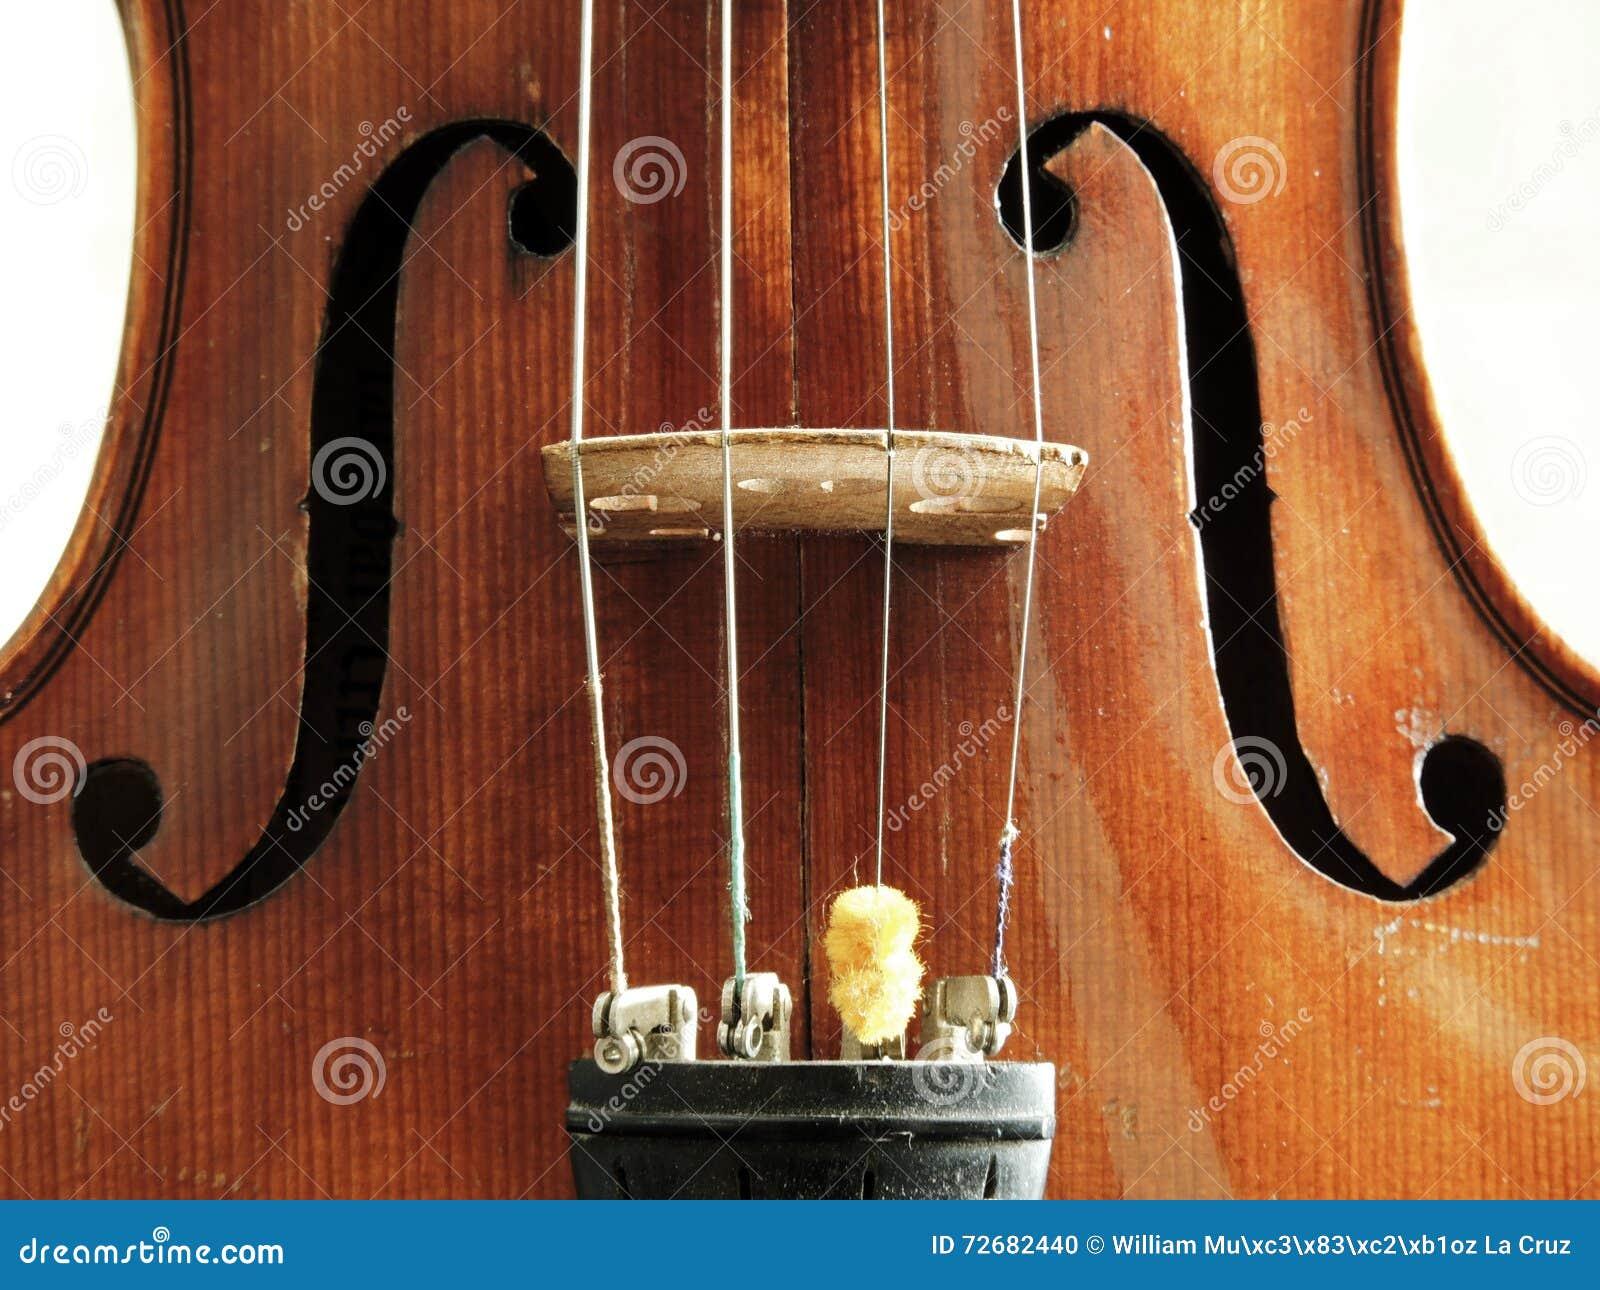 German violin stock photo  Image of musical, violinist